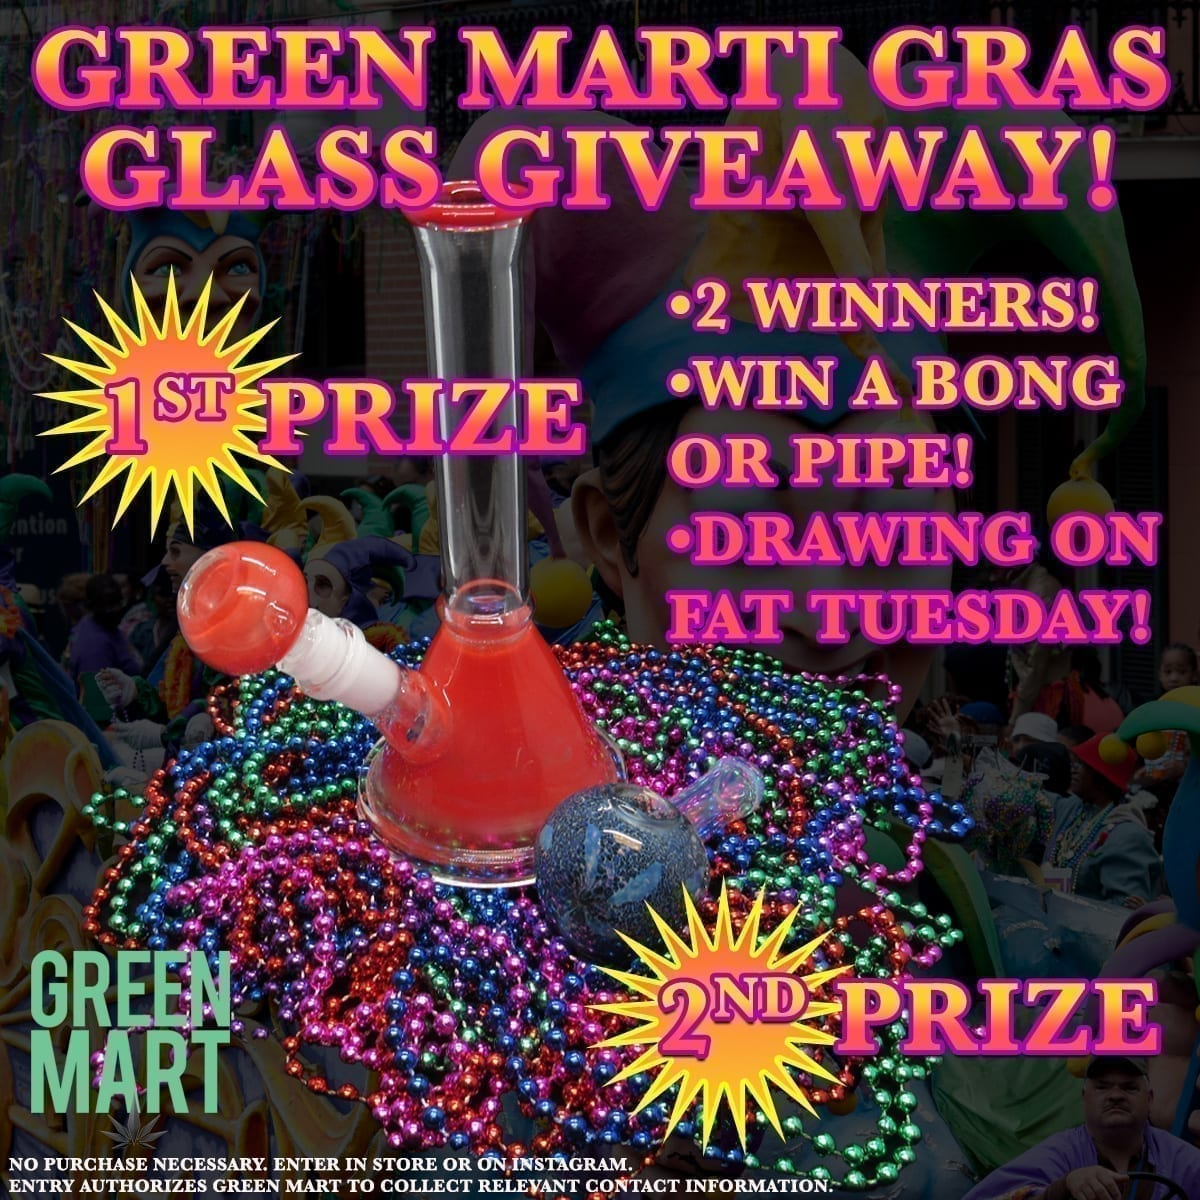 green marti gras glass giveaway square